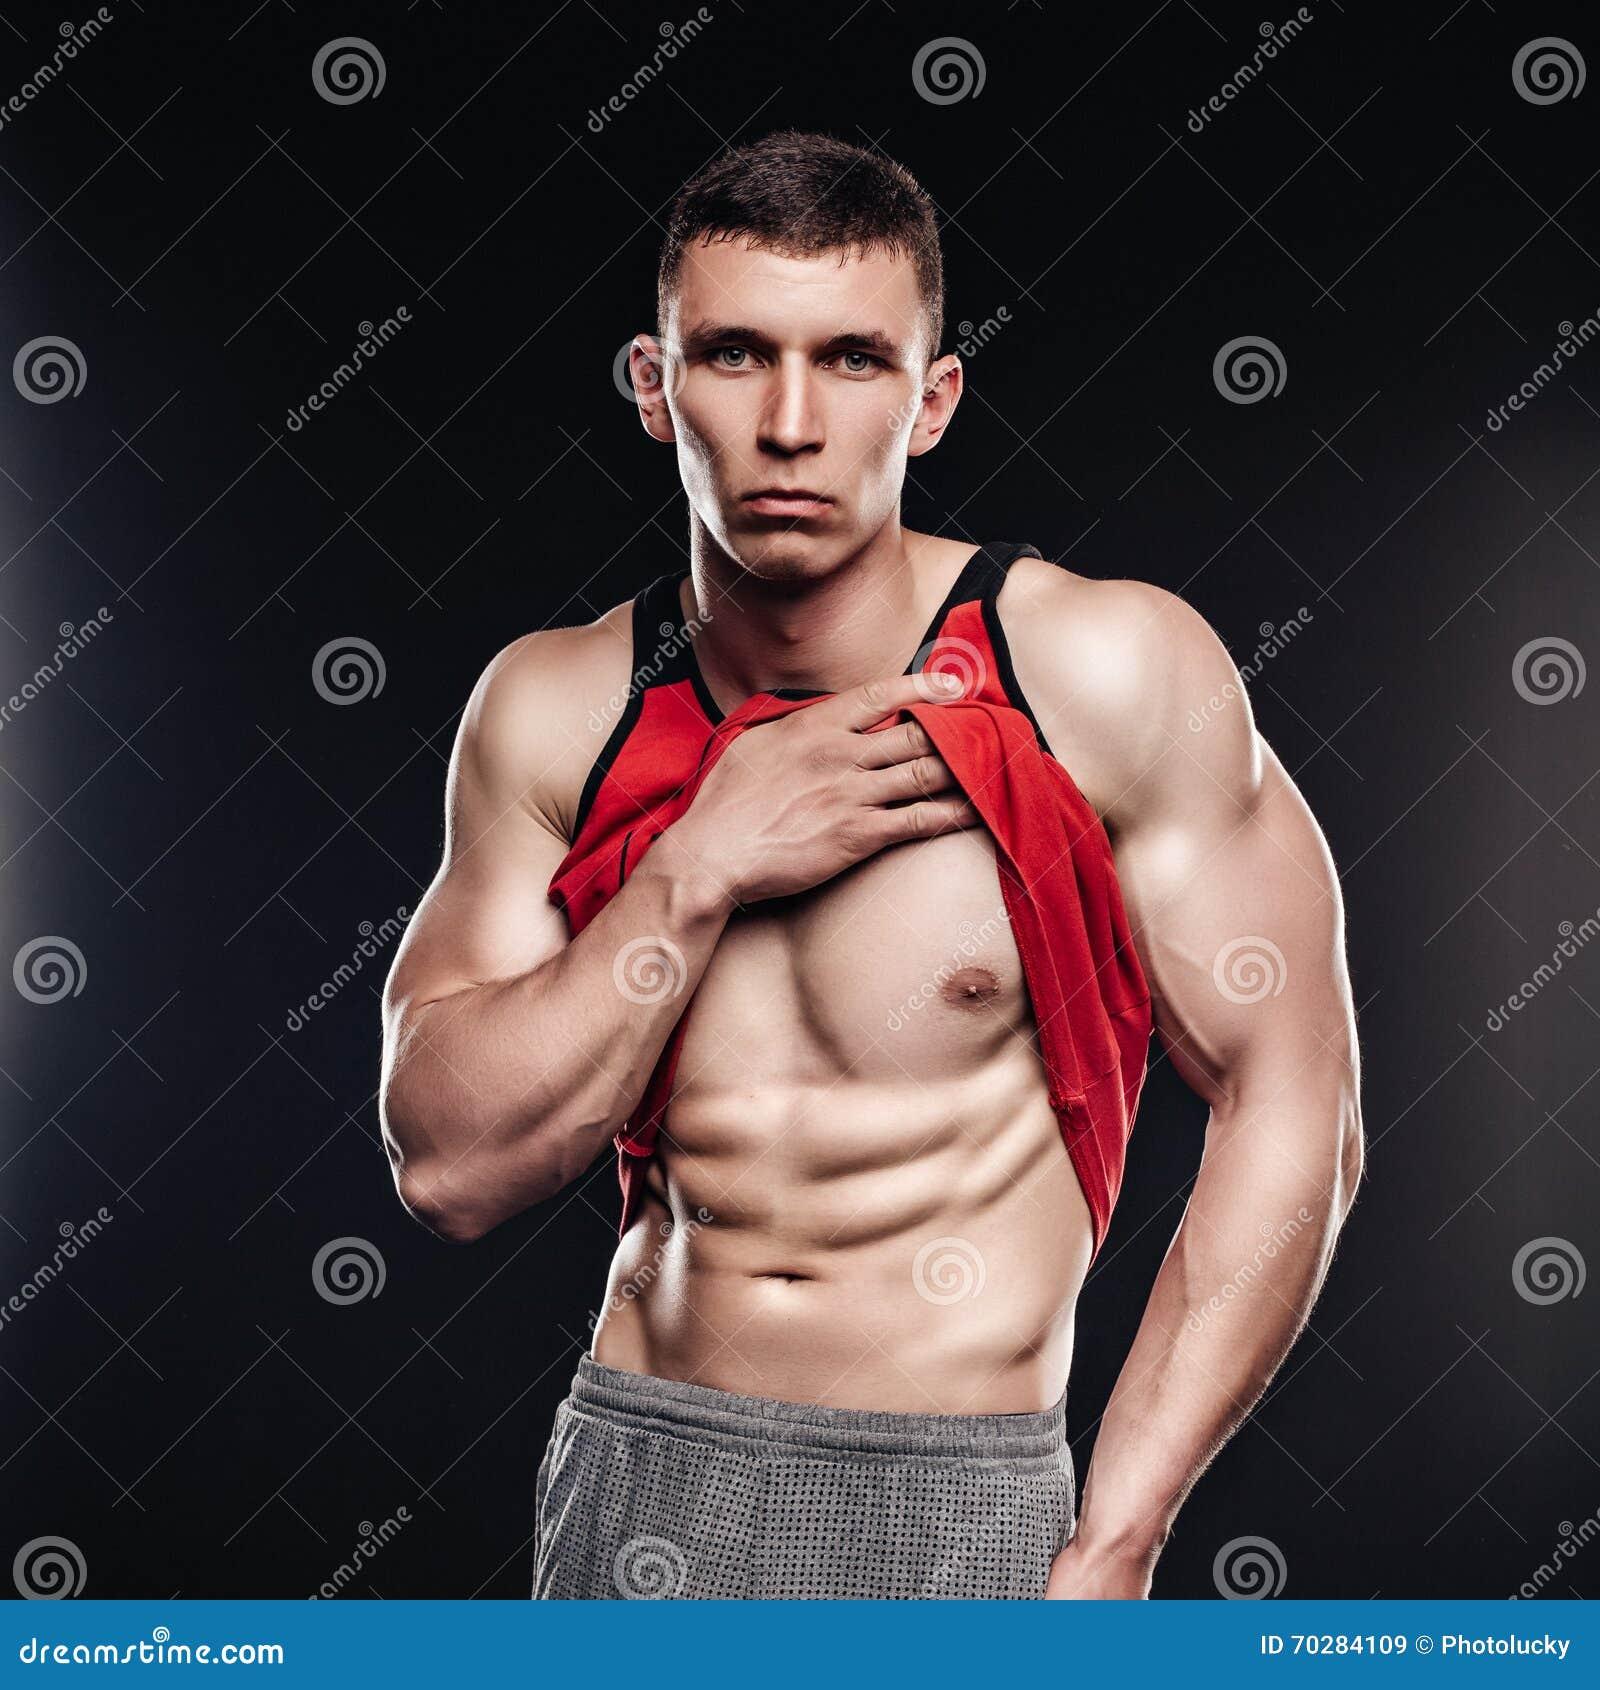 masturbation before sport